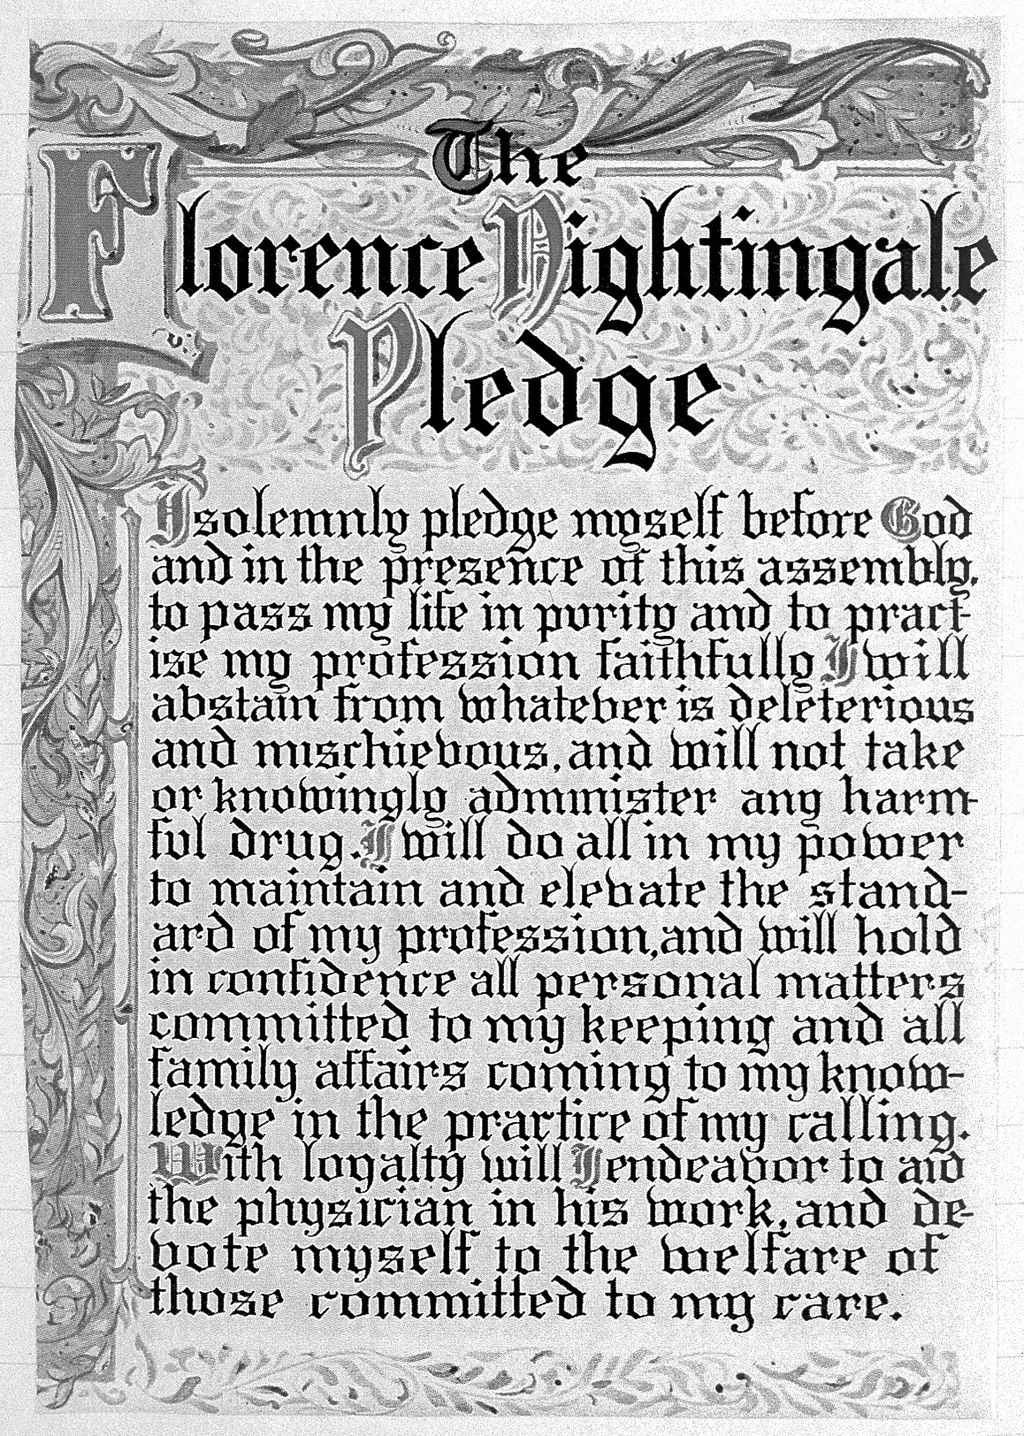 Pledge of Florence Nightingale